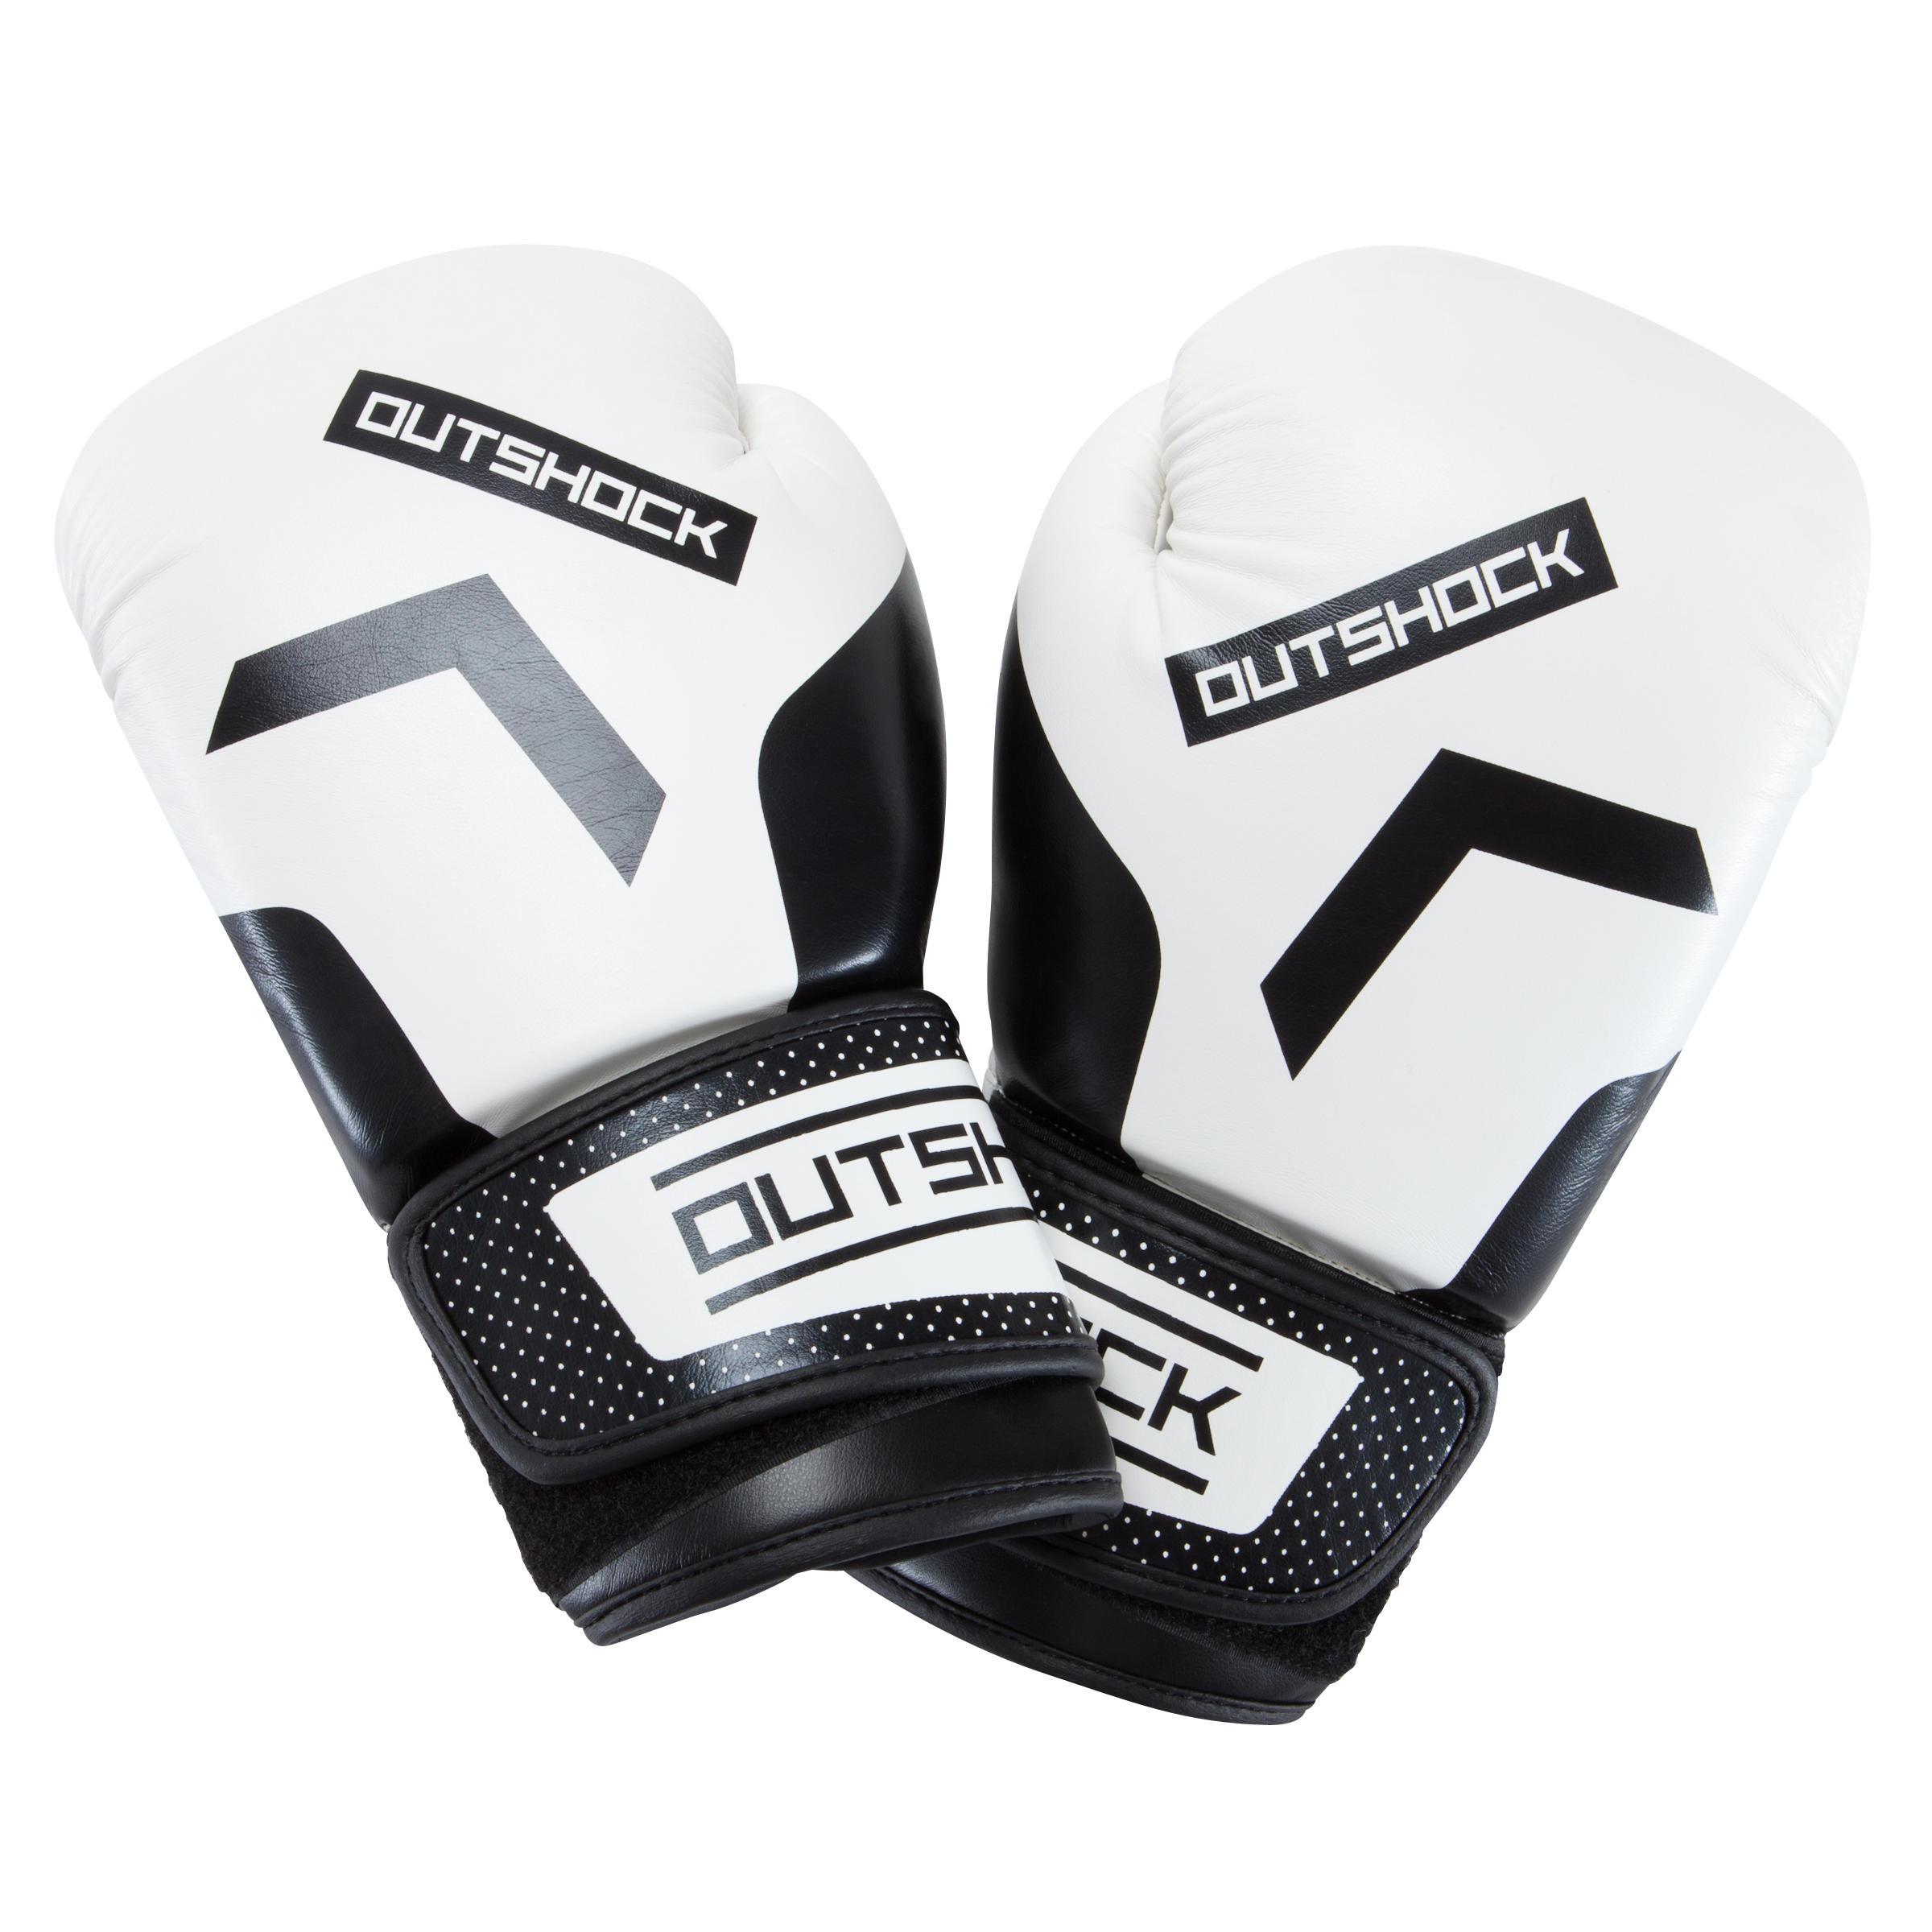 Boxhandschuhe 300 Erwachsene weiß   Accessoires > Handschuhe > Sonstige Handschuhe   Outshock